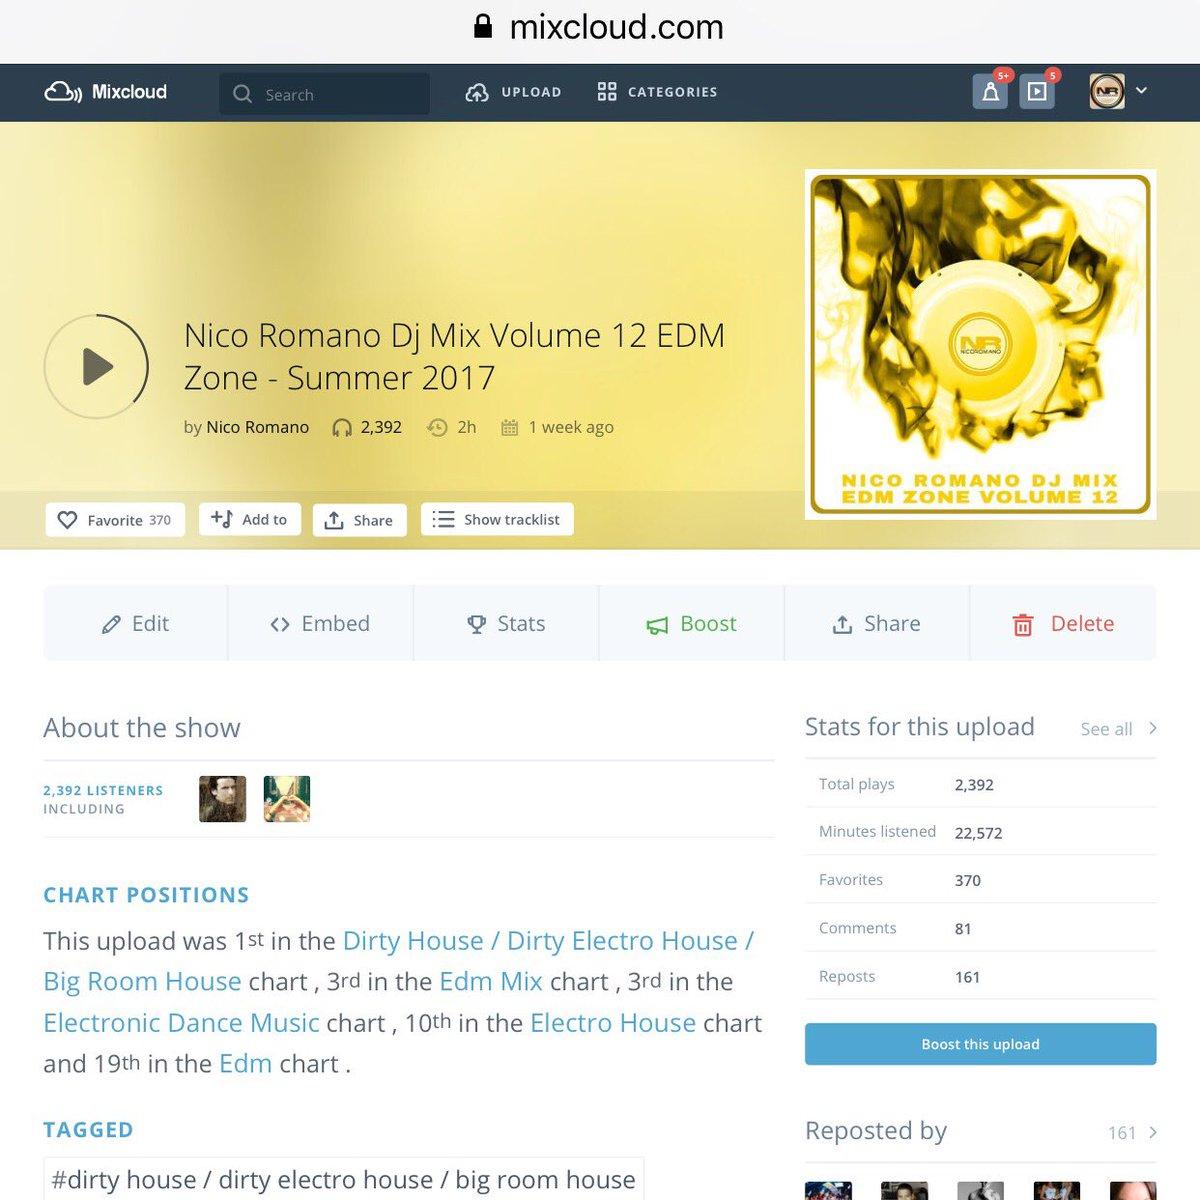 Great week for my new #EDM #DjMix on #Mixcloud  Thanks for the huge support #EDMFamily  #PLURFamily #RaveFamily   https://www. mixcloud.com/nicoromano/nic o-romano-dj-mix-volume-12-edm-zone-summer-2017/ &nbsp; … <br>http://pic.twitter.com/bVp59OFVxD